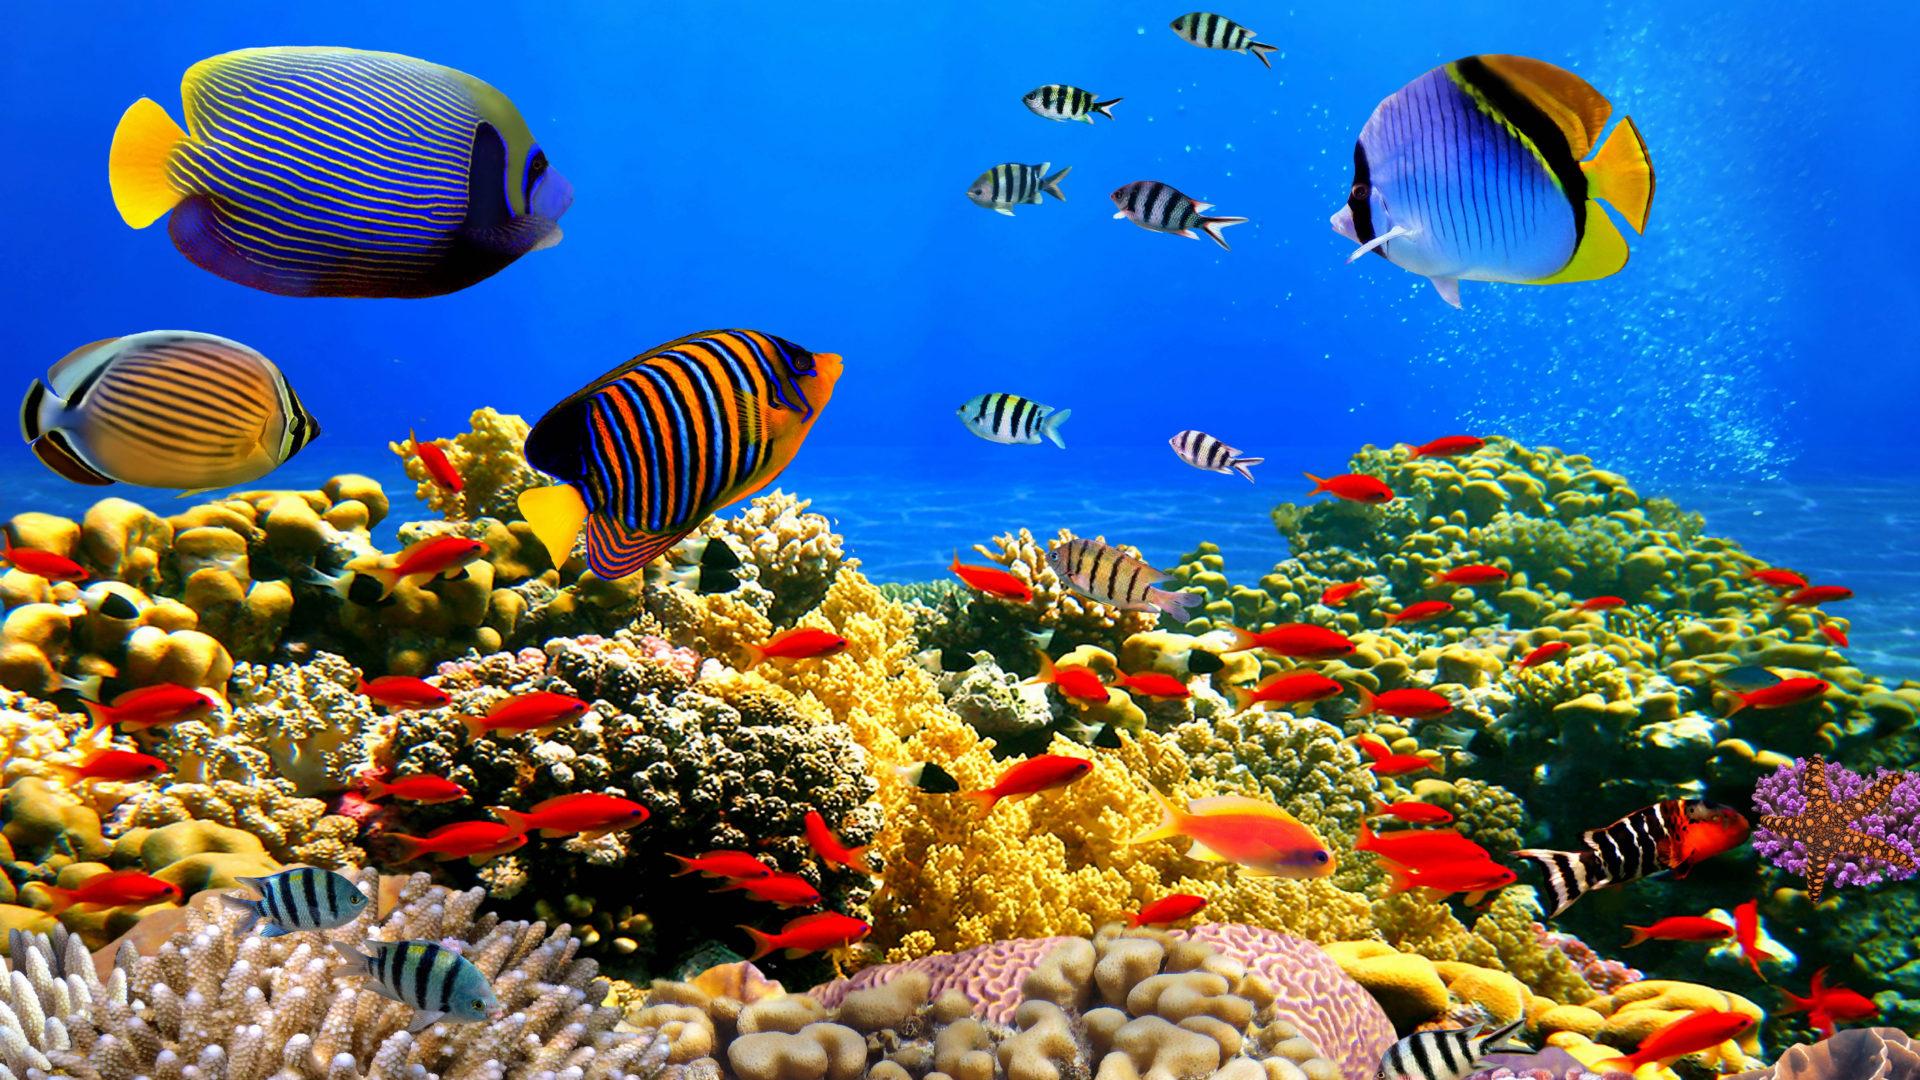 Underwater World Corals Tropical Colorful Fish Hd Desktop